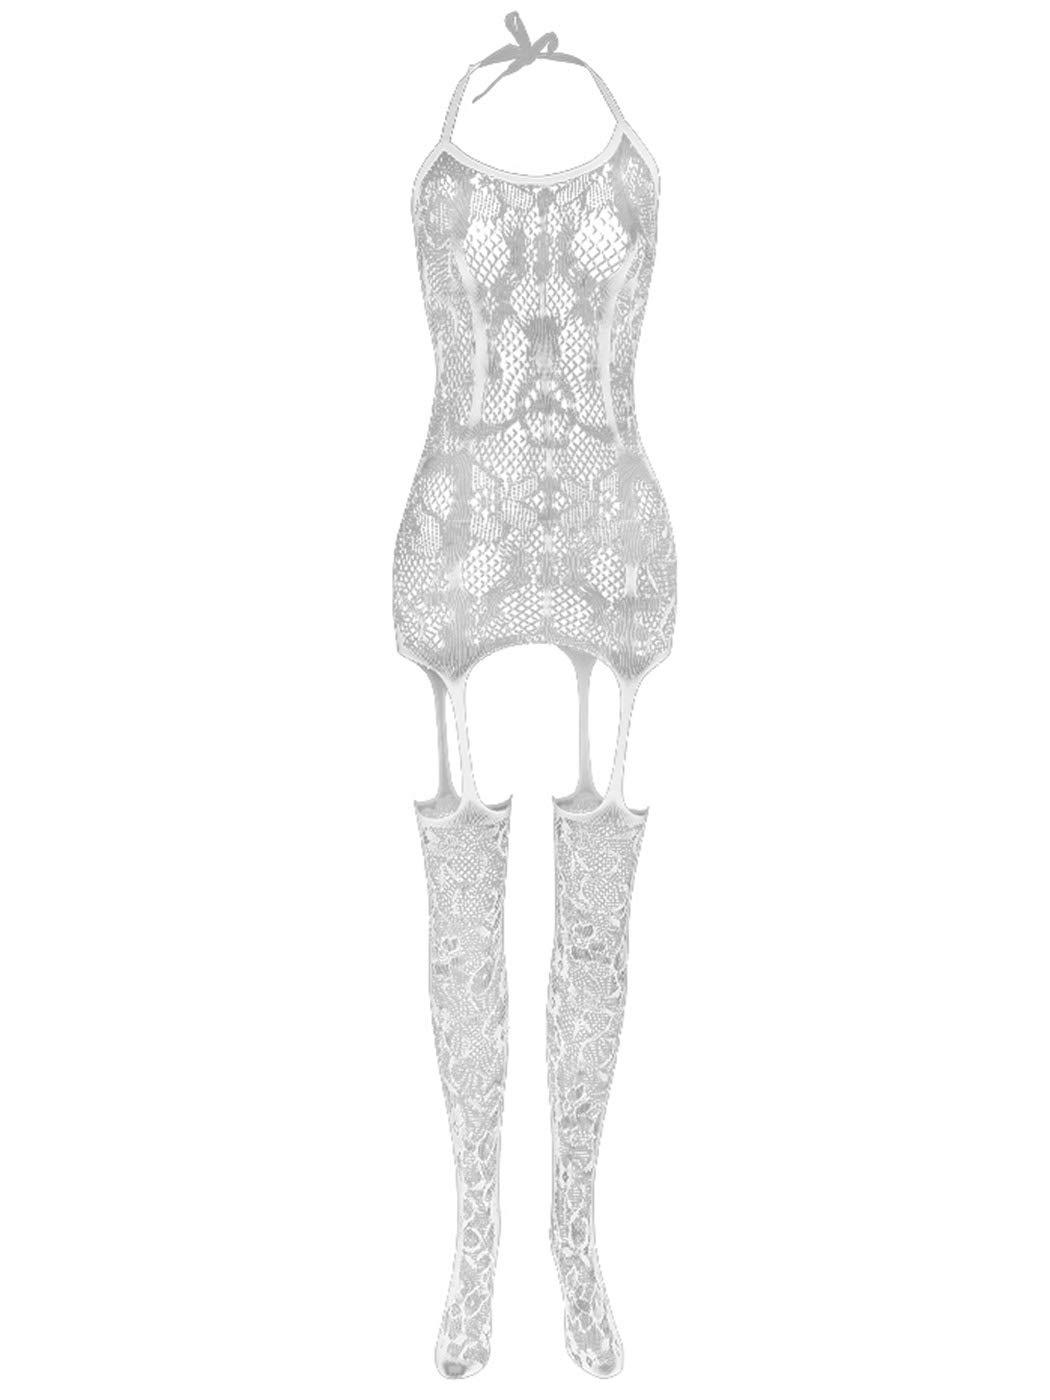 Asooll Mesh Bodysuits Lingerie Max 88% OFF Ranking TOP1 Fishnet Dress L Sleepwear Elastic